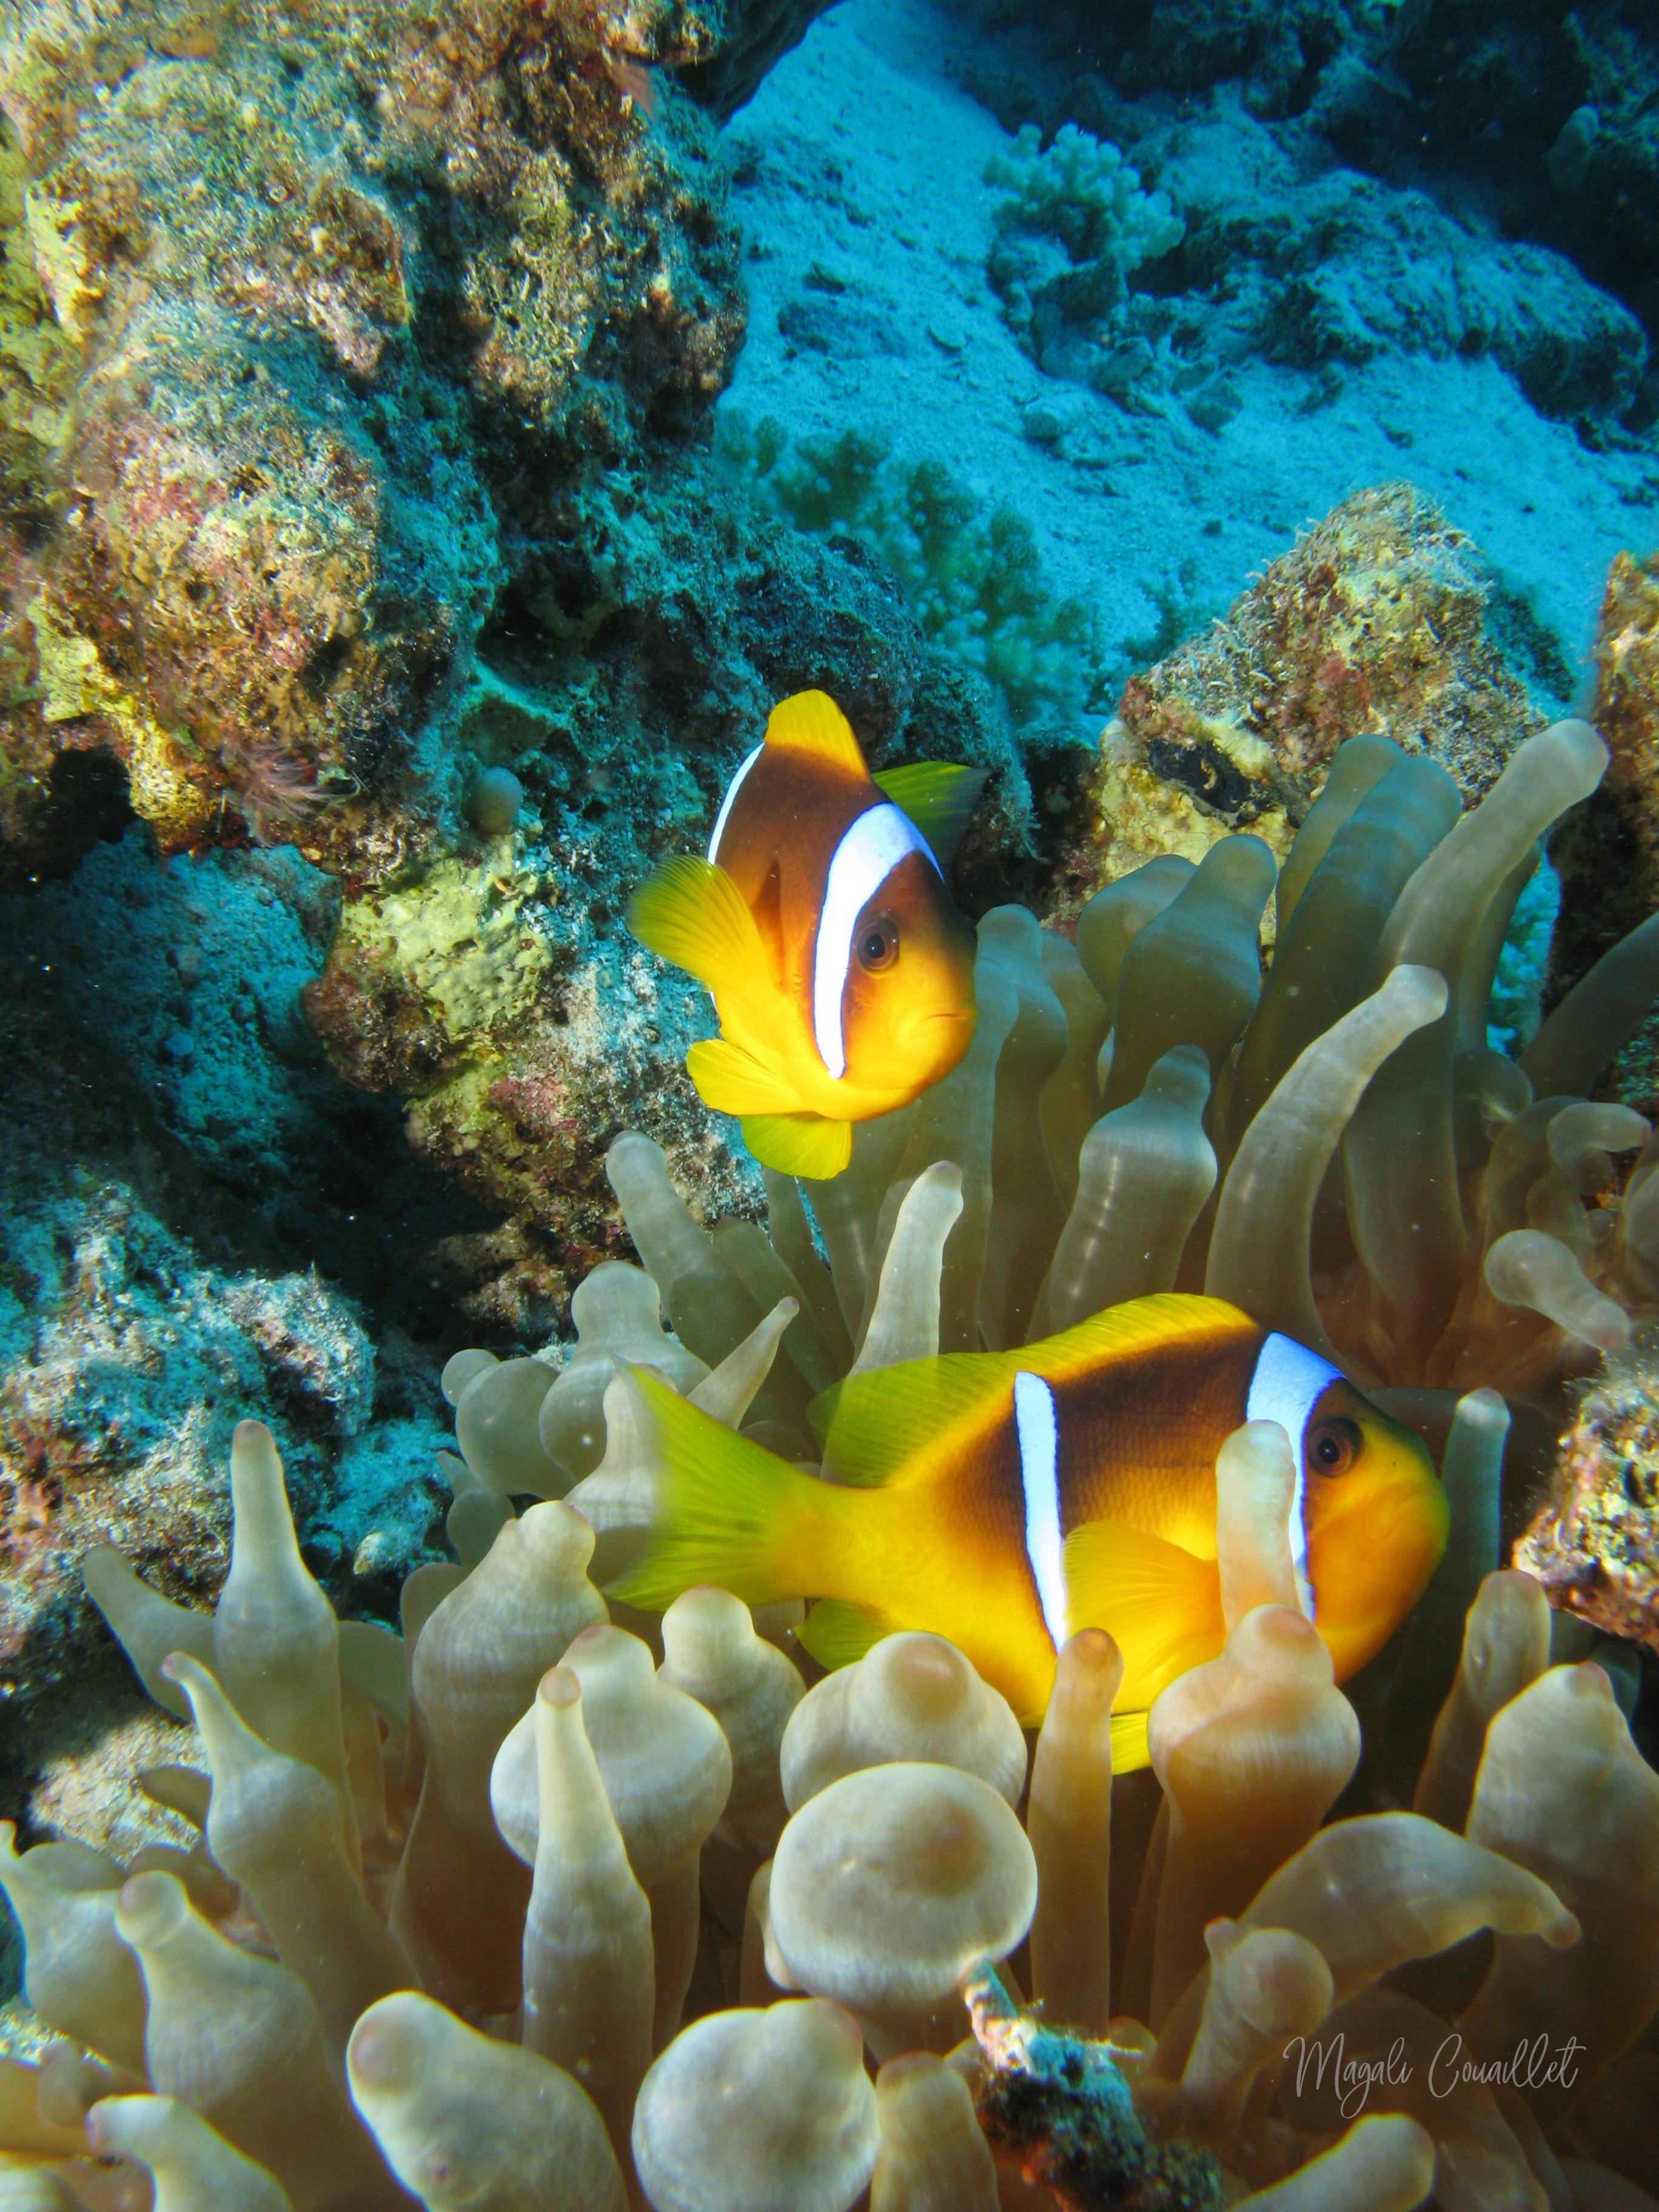 Poissons-clowns - Clownfish